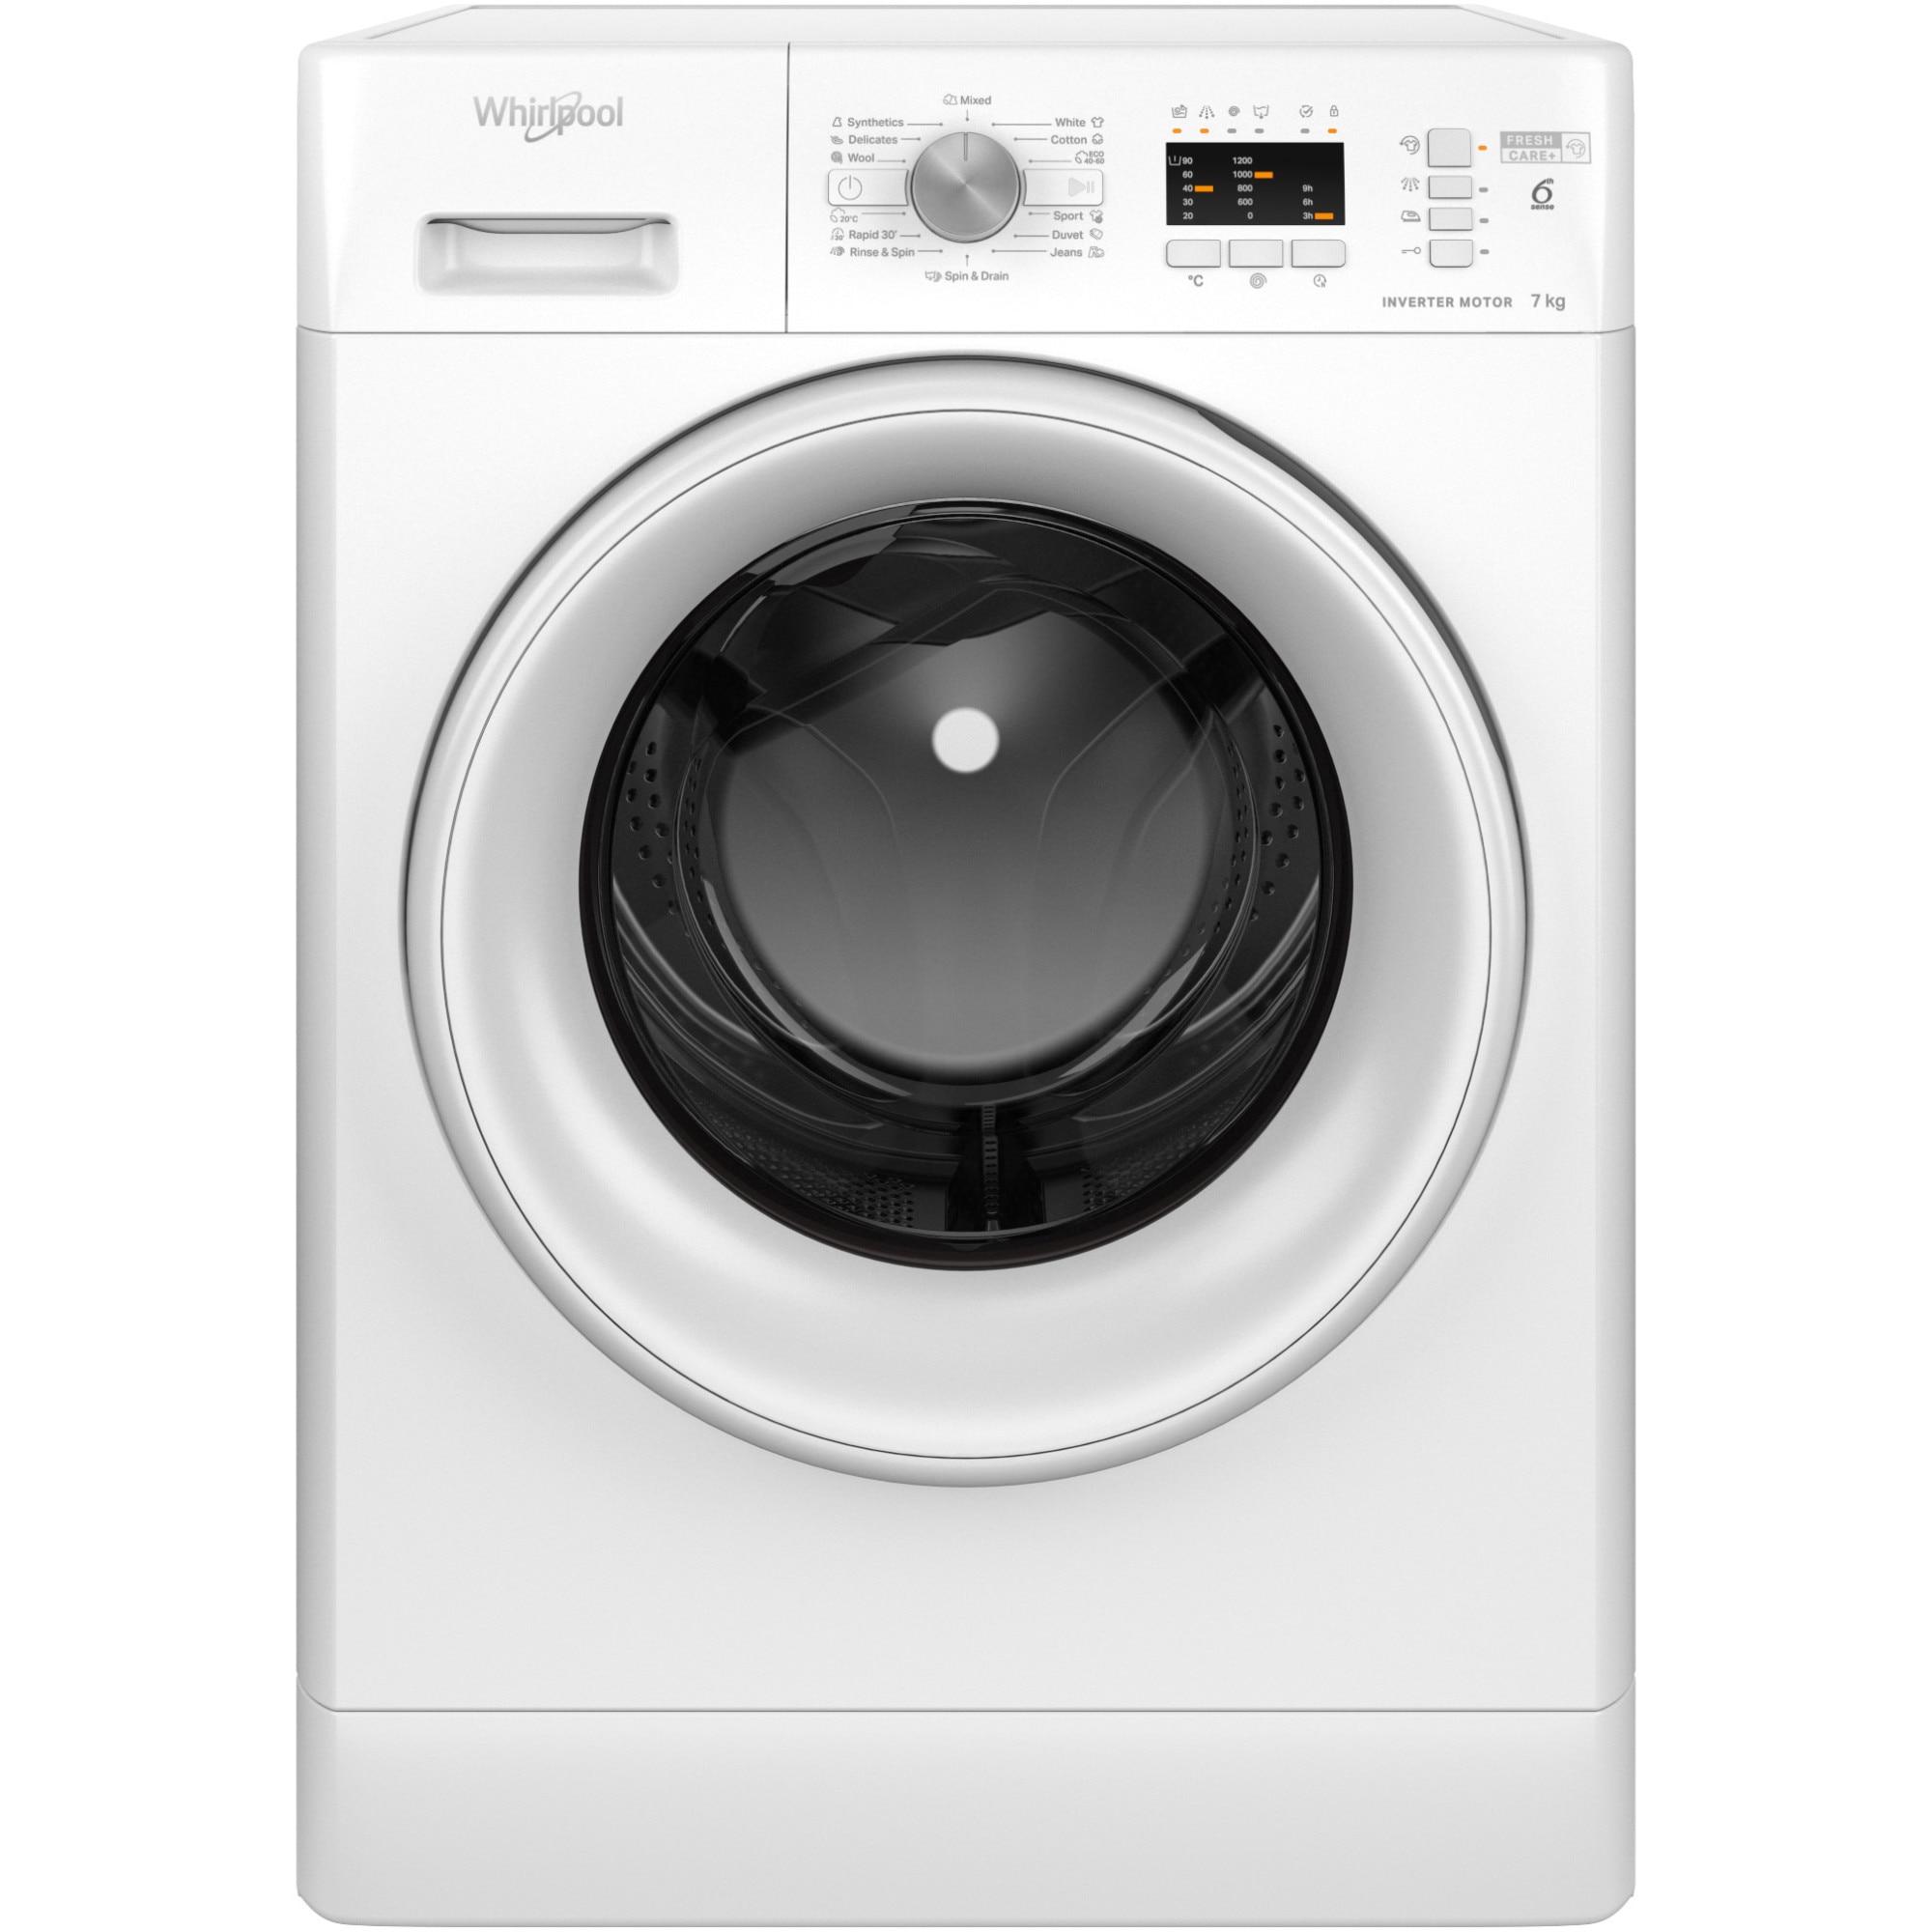 Fotografie Masina de spalat rufe Whirlpool FFL7238WEE, 7kg, 1200 RPM, Clasa D, Tehnologia al 6-lea Simt, Motor Inverter, FreshCare, Alb